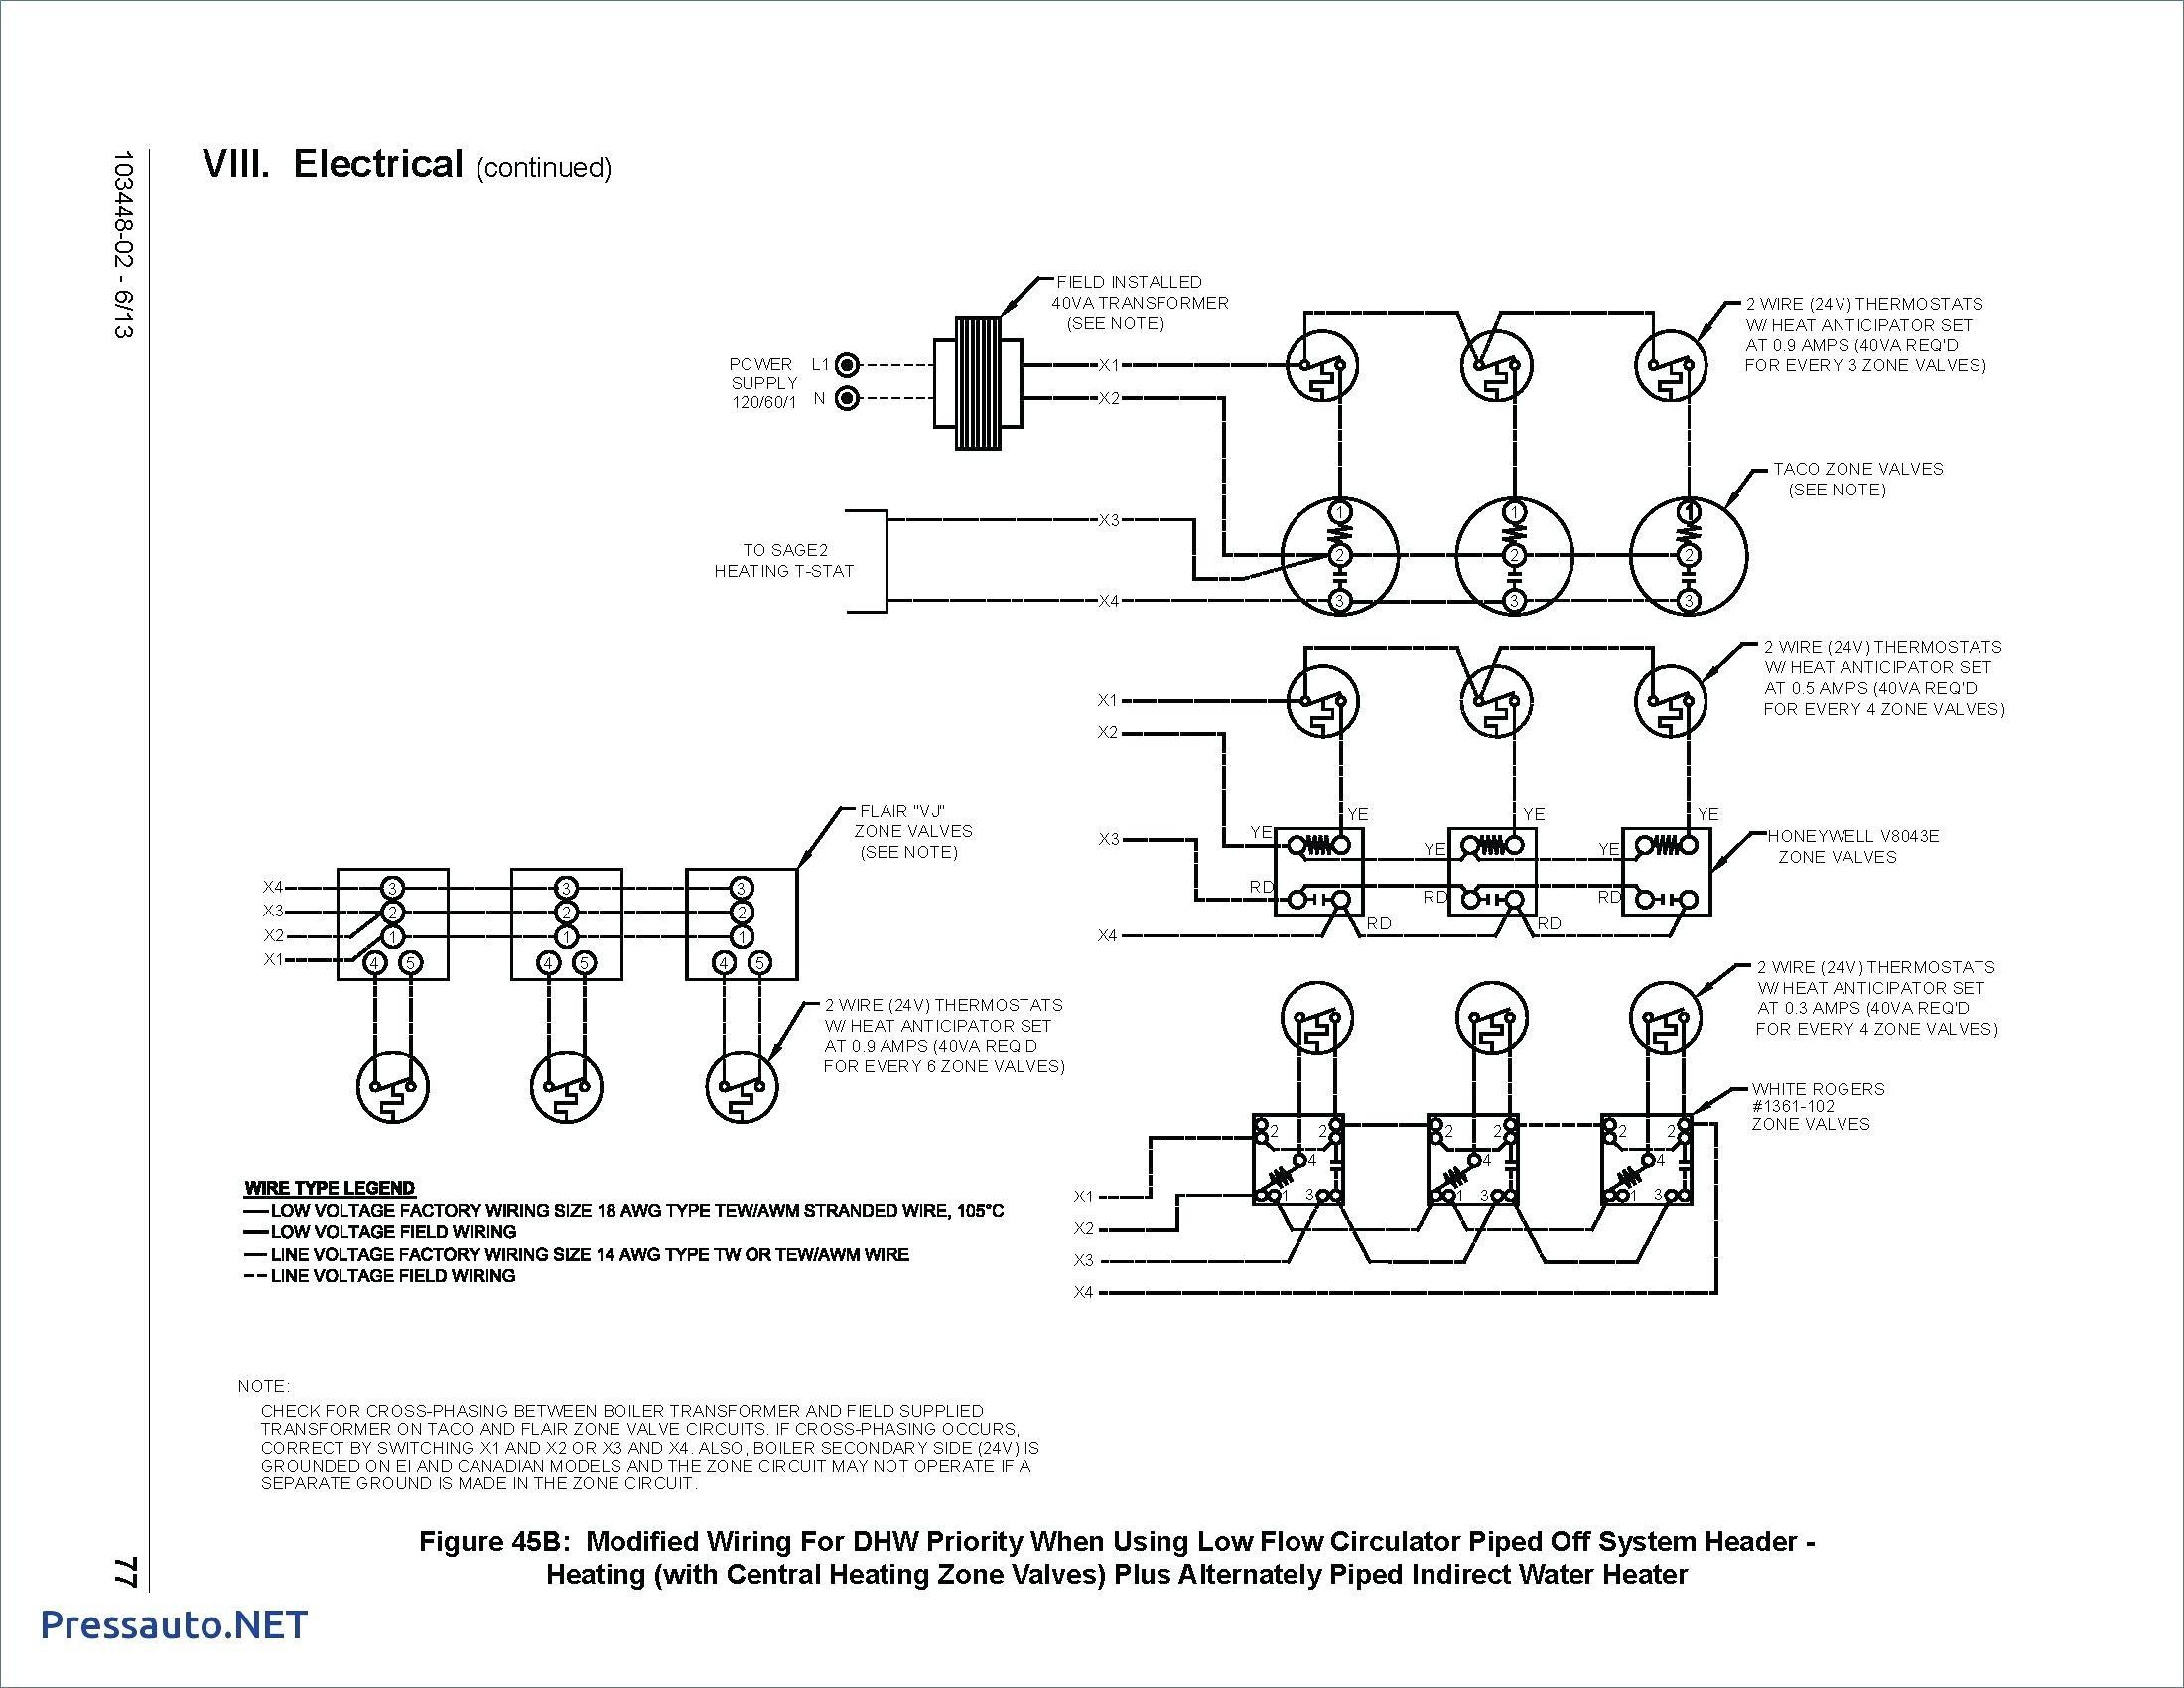 Taco Zone Valves Wiring Diagram Taco Zone Valves Wiring Diagram Gooddy org at Webtor Me In Valve Of Taco Zone Valves Wiring Diagram